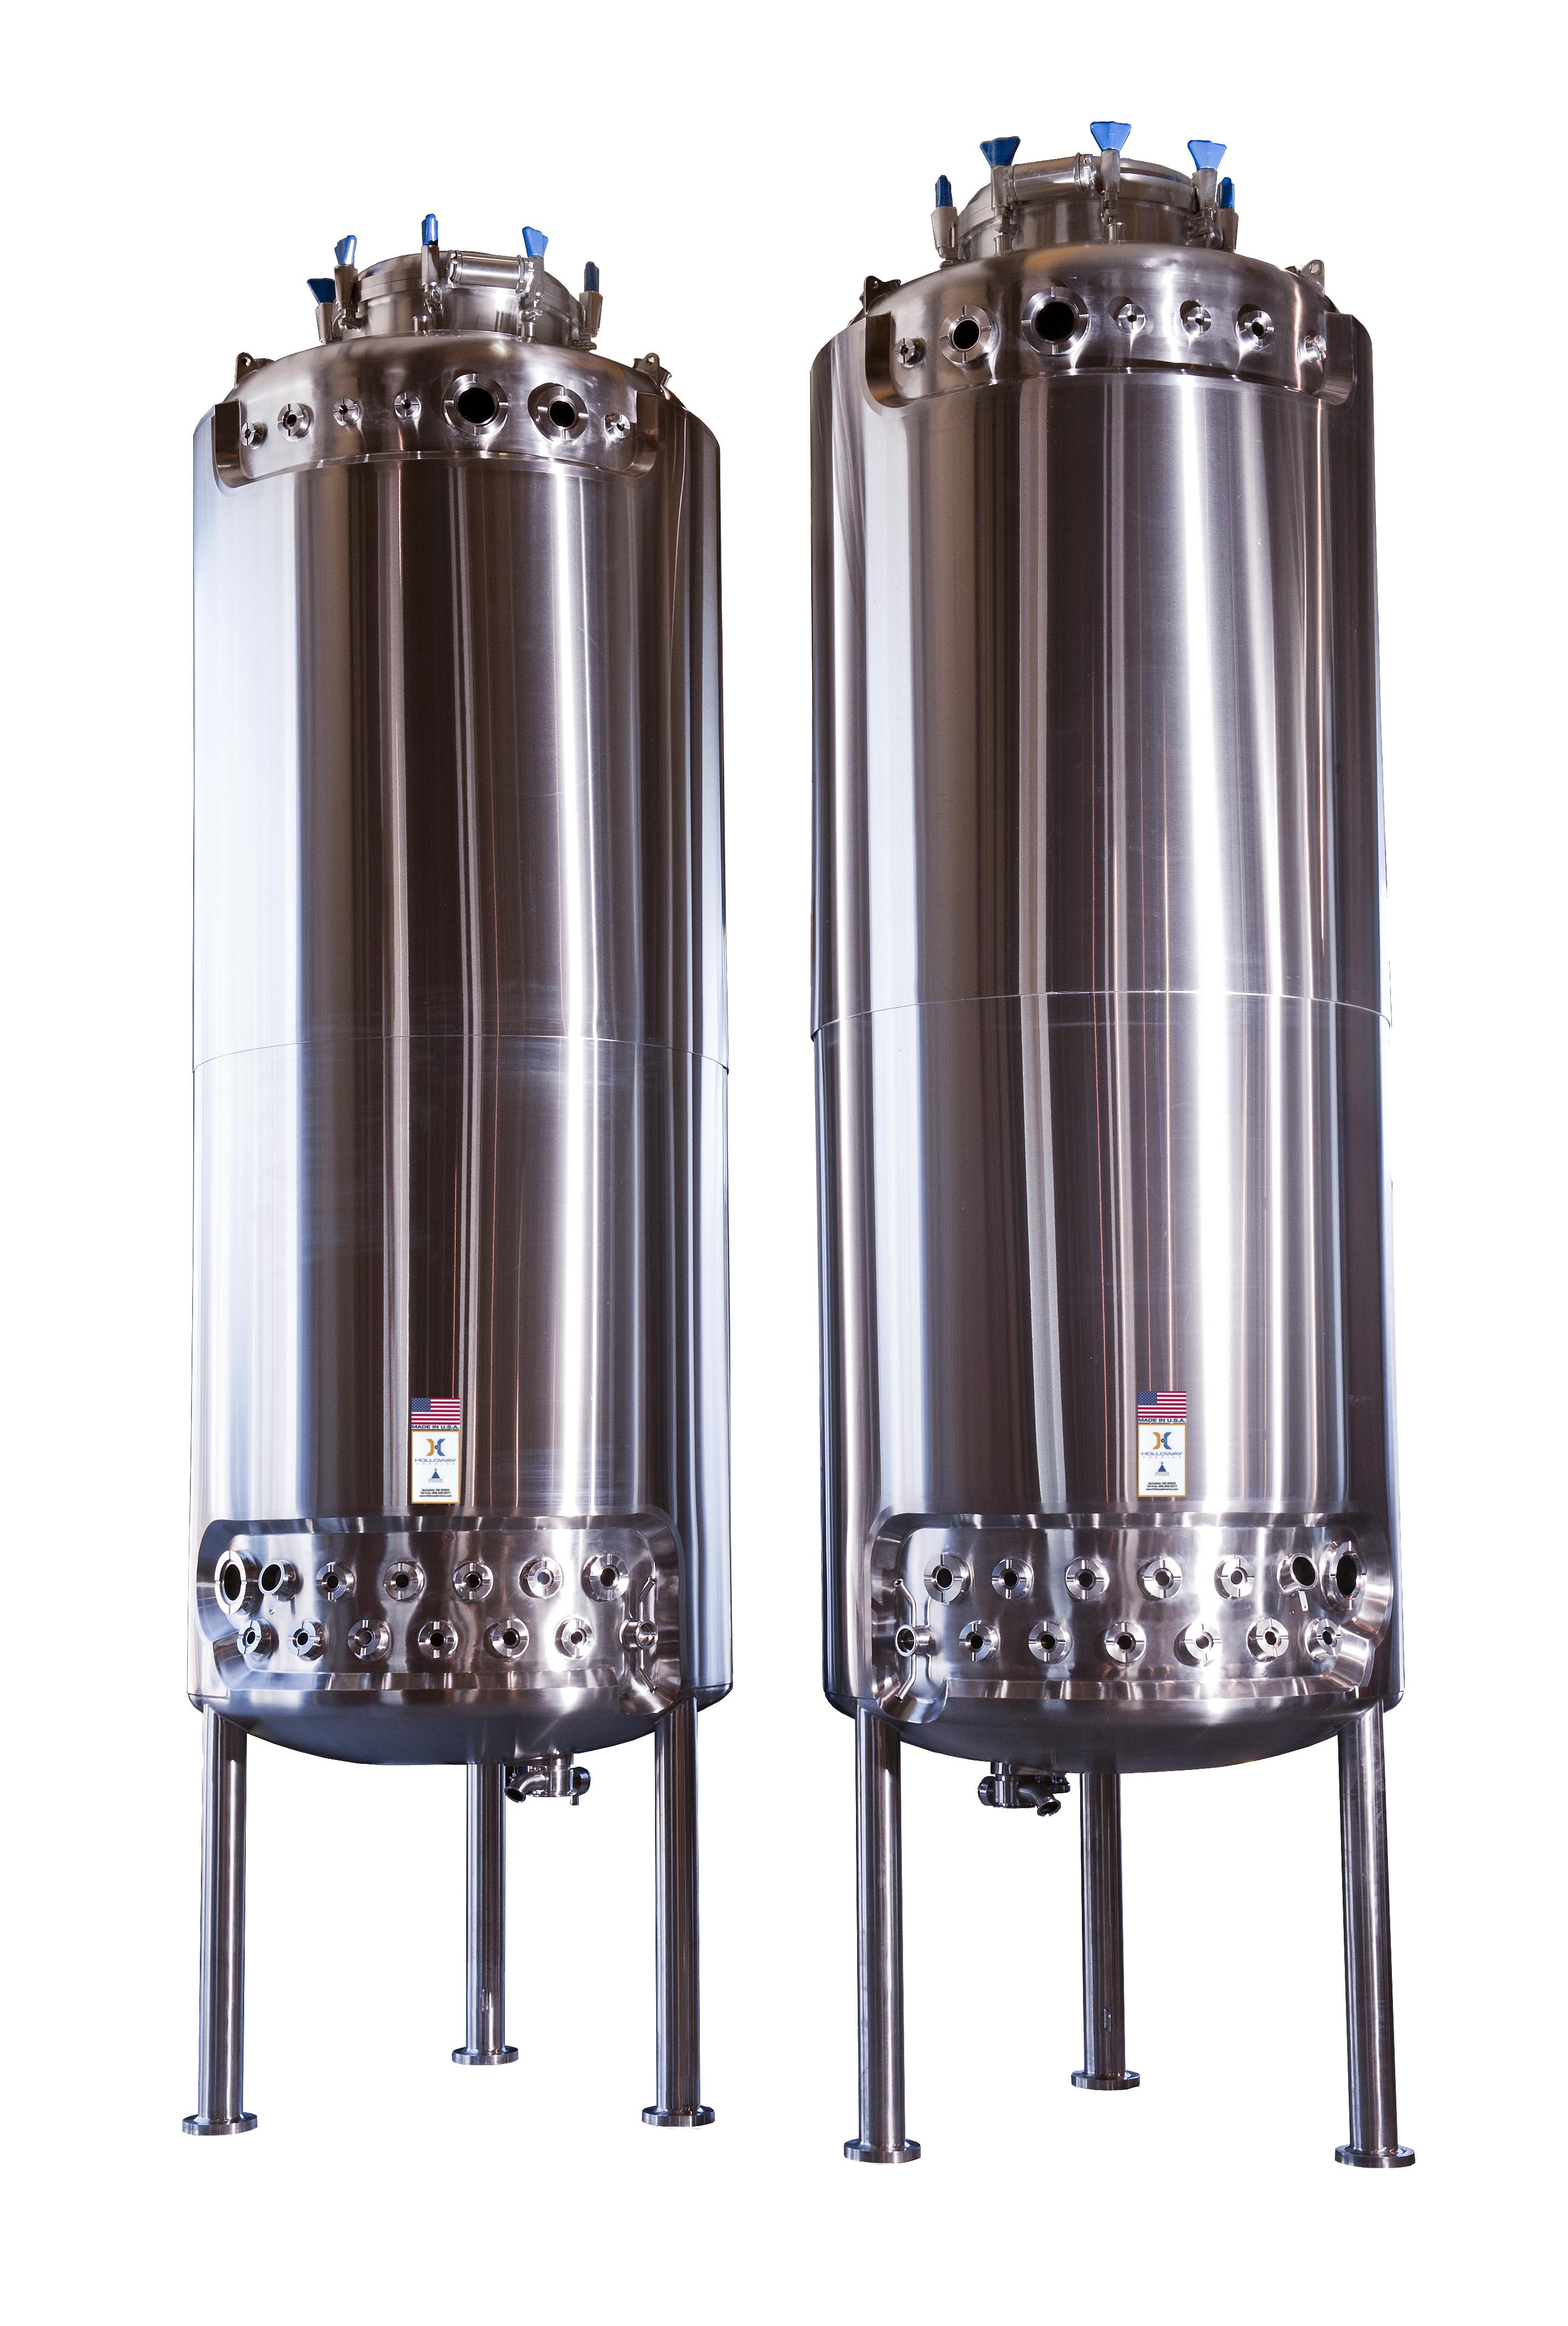 ASME pressure vessels like these fermenters adhere to ASME code.